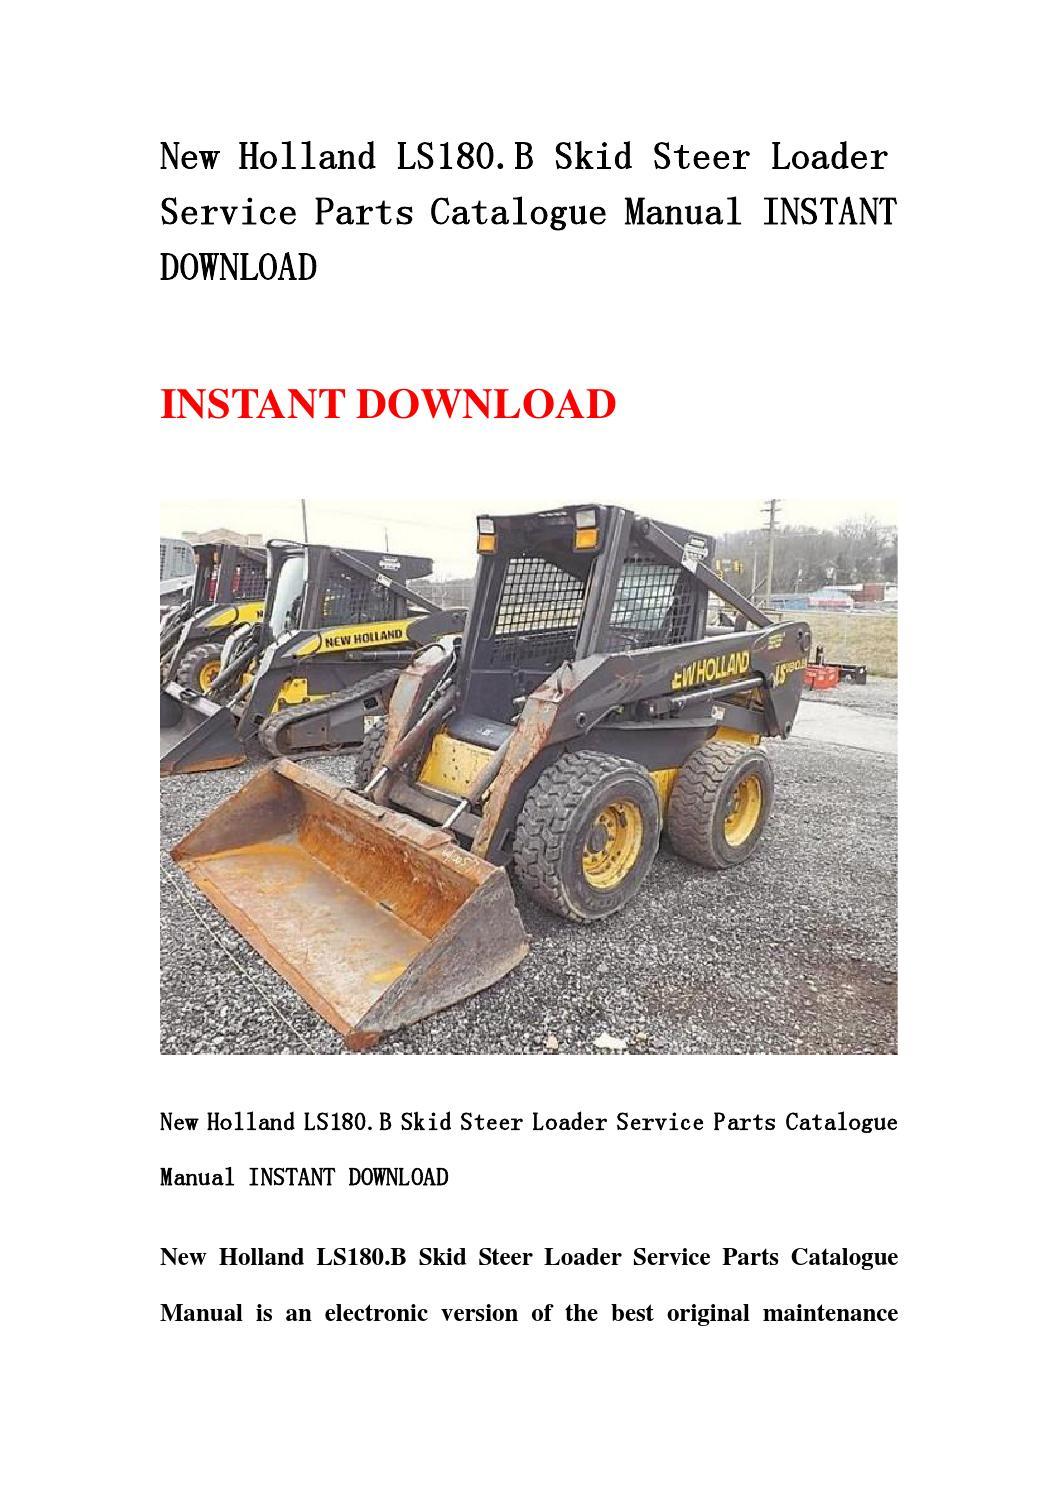 new holland skid steer manual